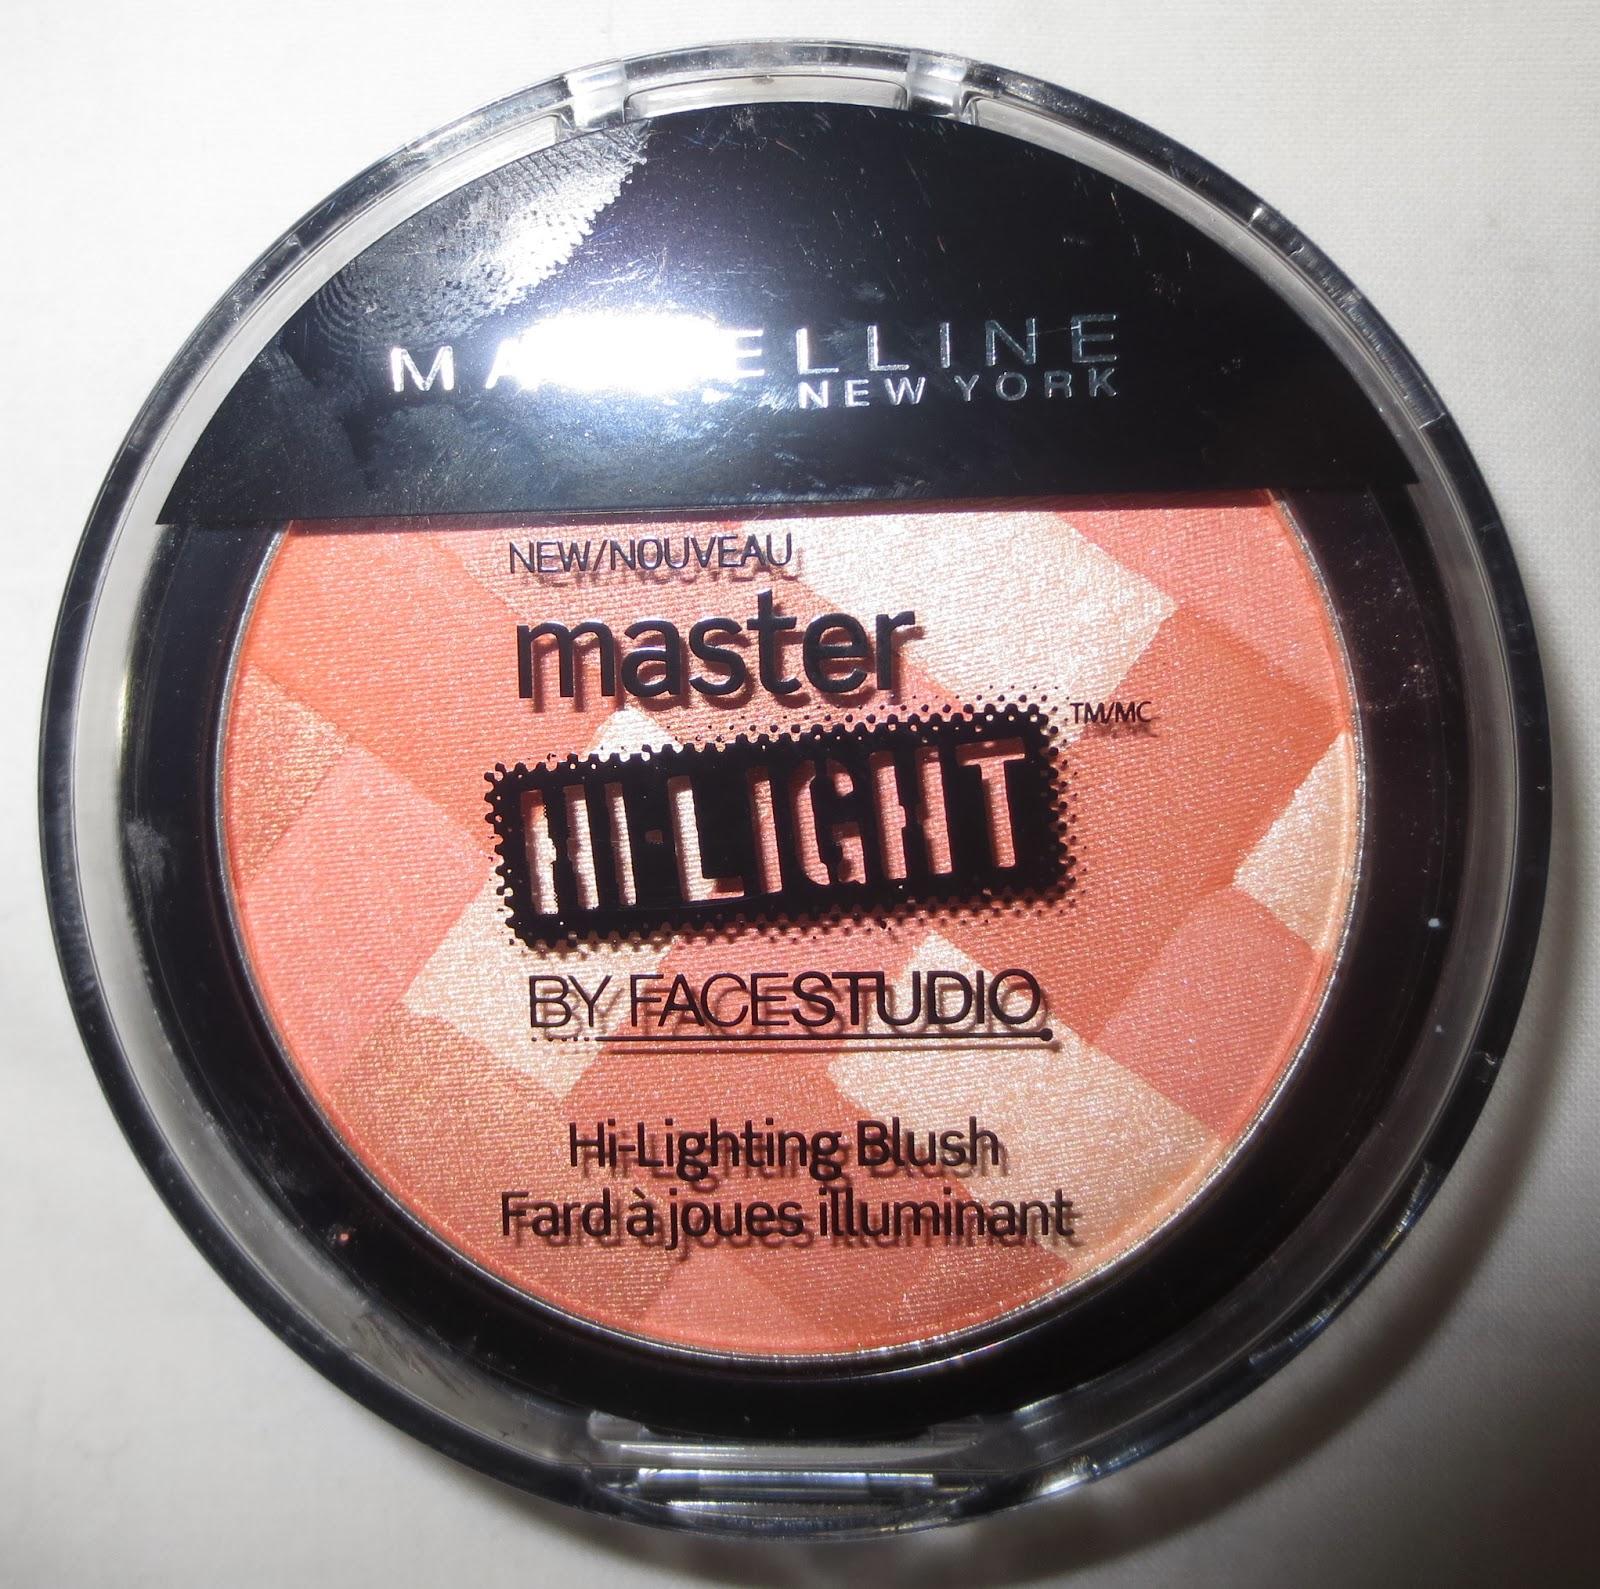 Maybelline Master Hi-Light in Coral